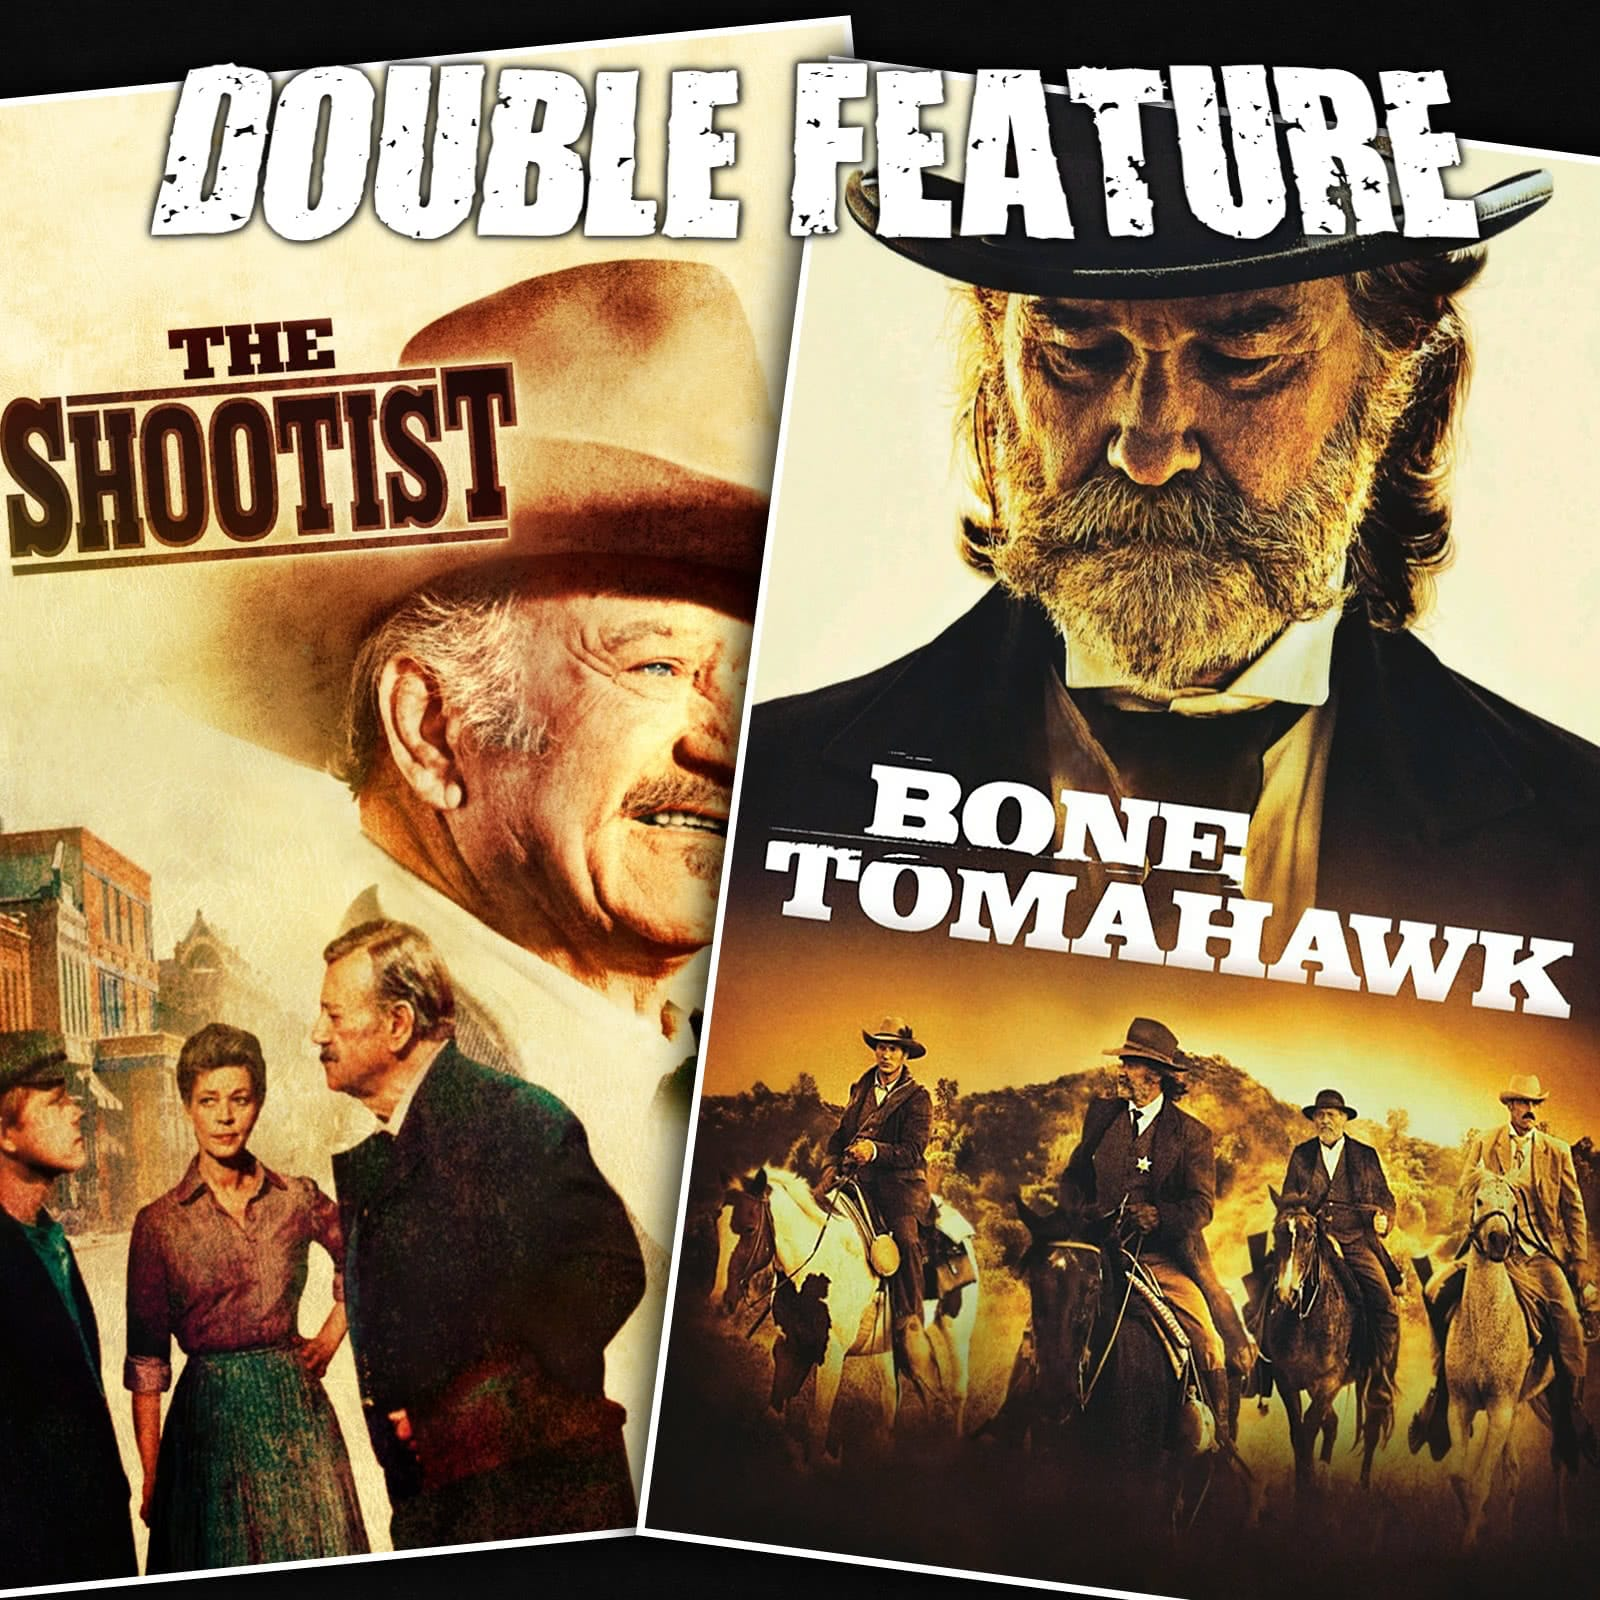 bone tomahawk full movie free download